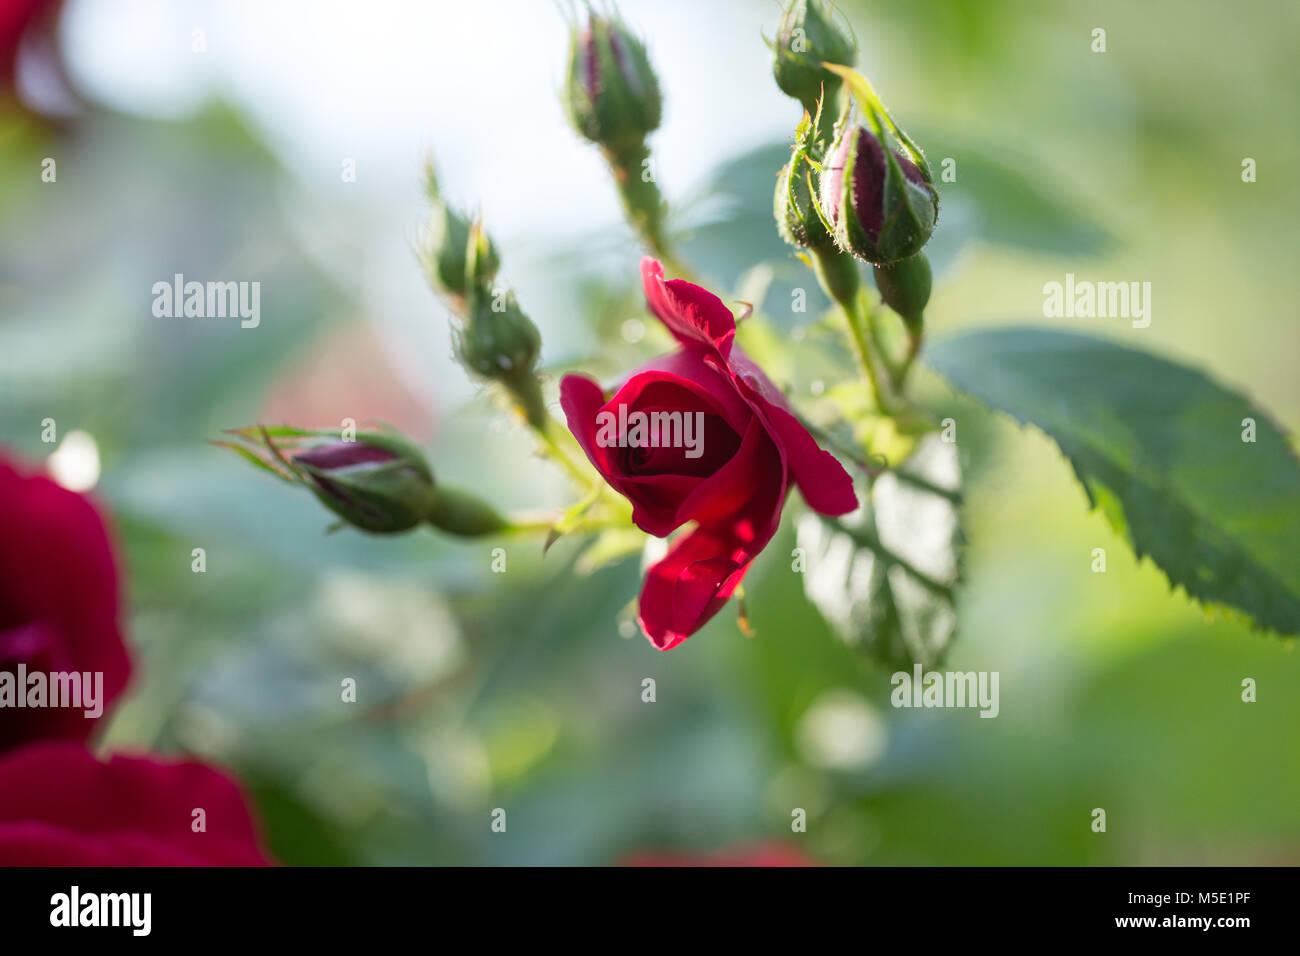 Romance petal romantic valentine plant love beautiful beauty romance petal romantic valentine plant love beautiful beauty flower rose nature rose flowers rose flower red stamens blurring shine izmirmasajfo